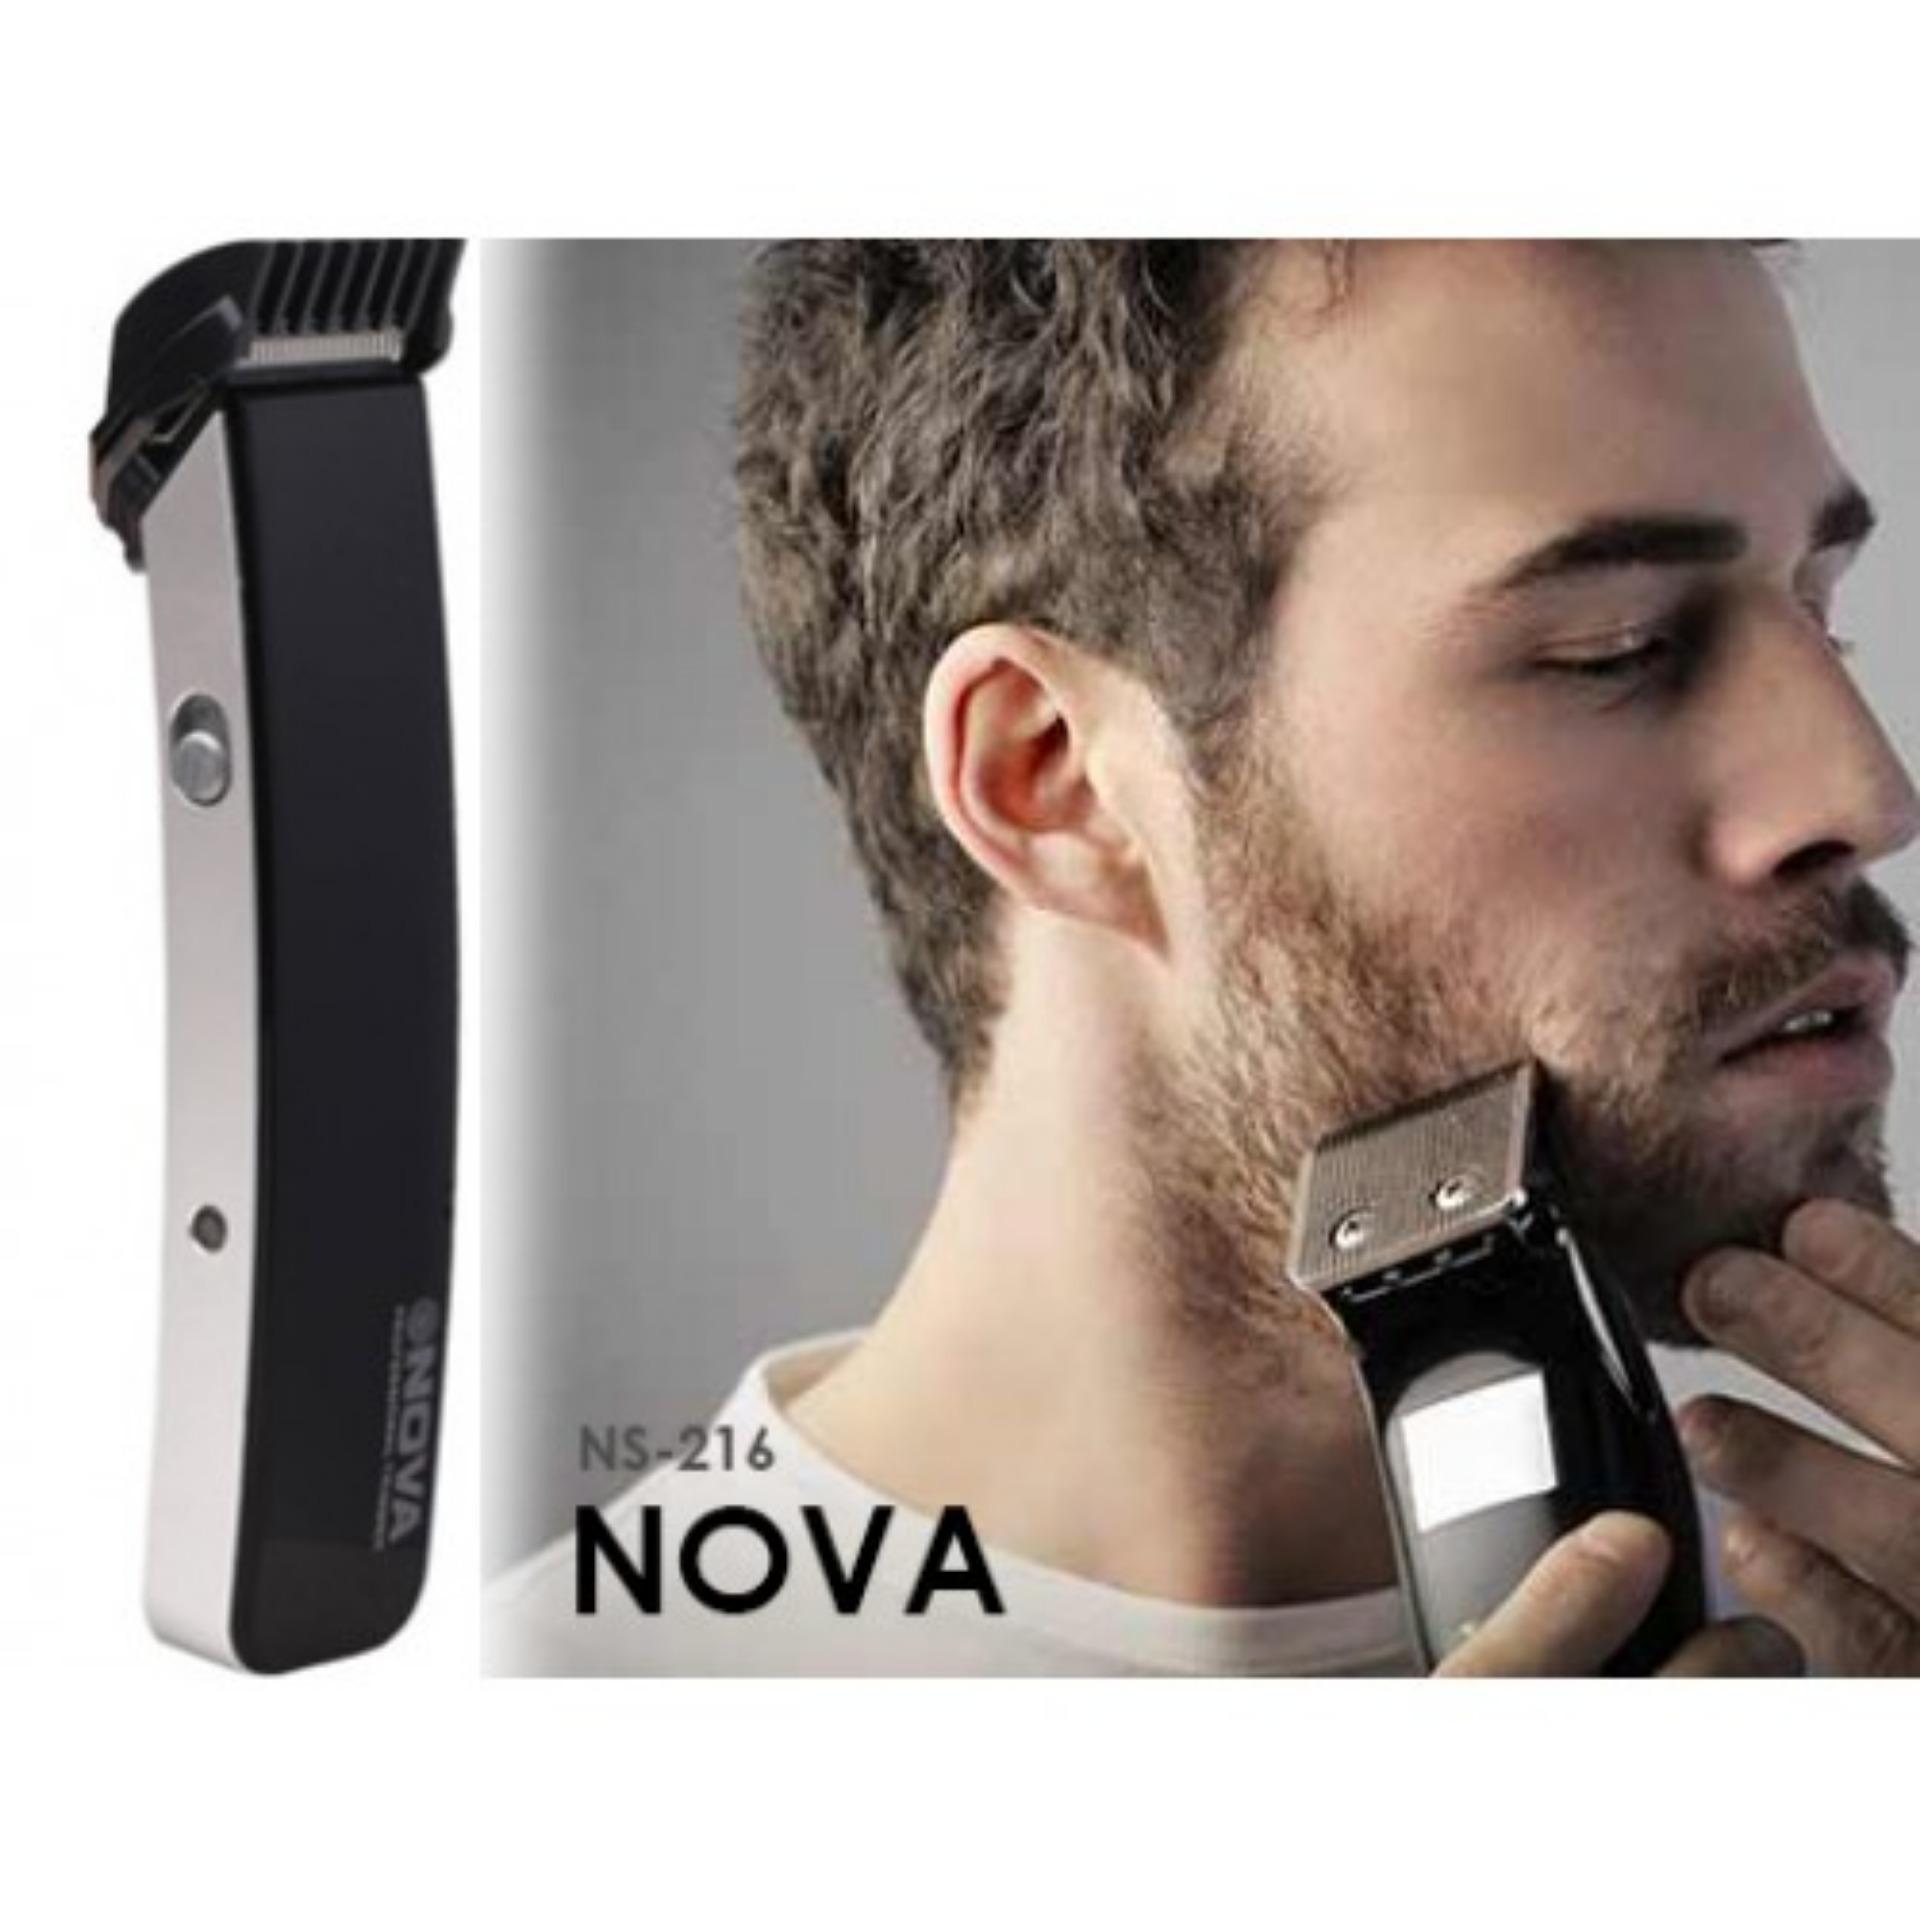 Nova Alat Cukur 3in1 Rambut Jenggot Bulu Hidung Hair Beard Trimmer Ns 216 And Dll Clipper Nhc 6138 Random Source